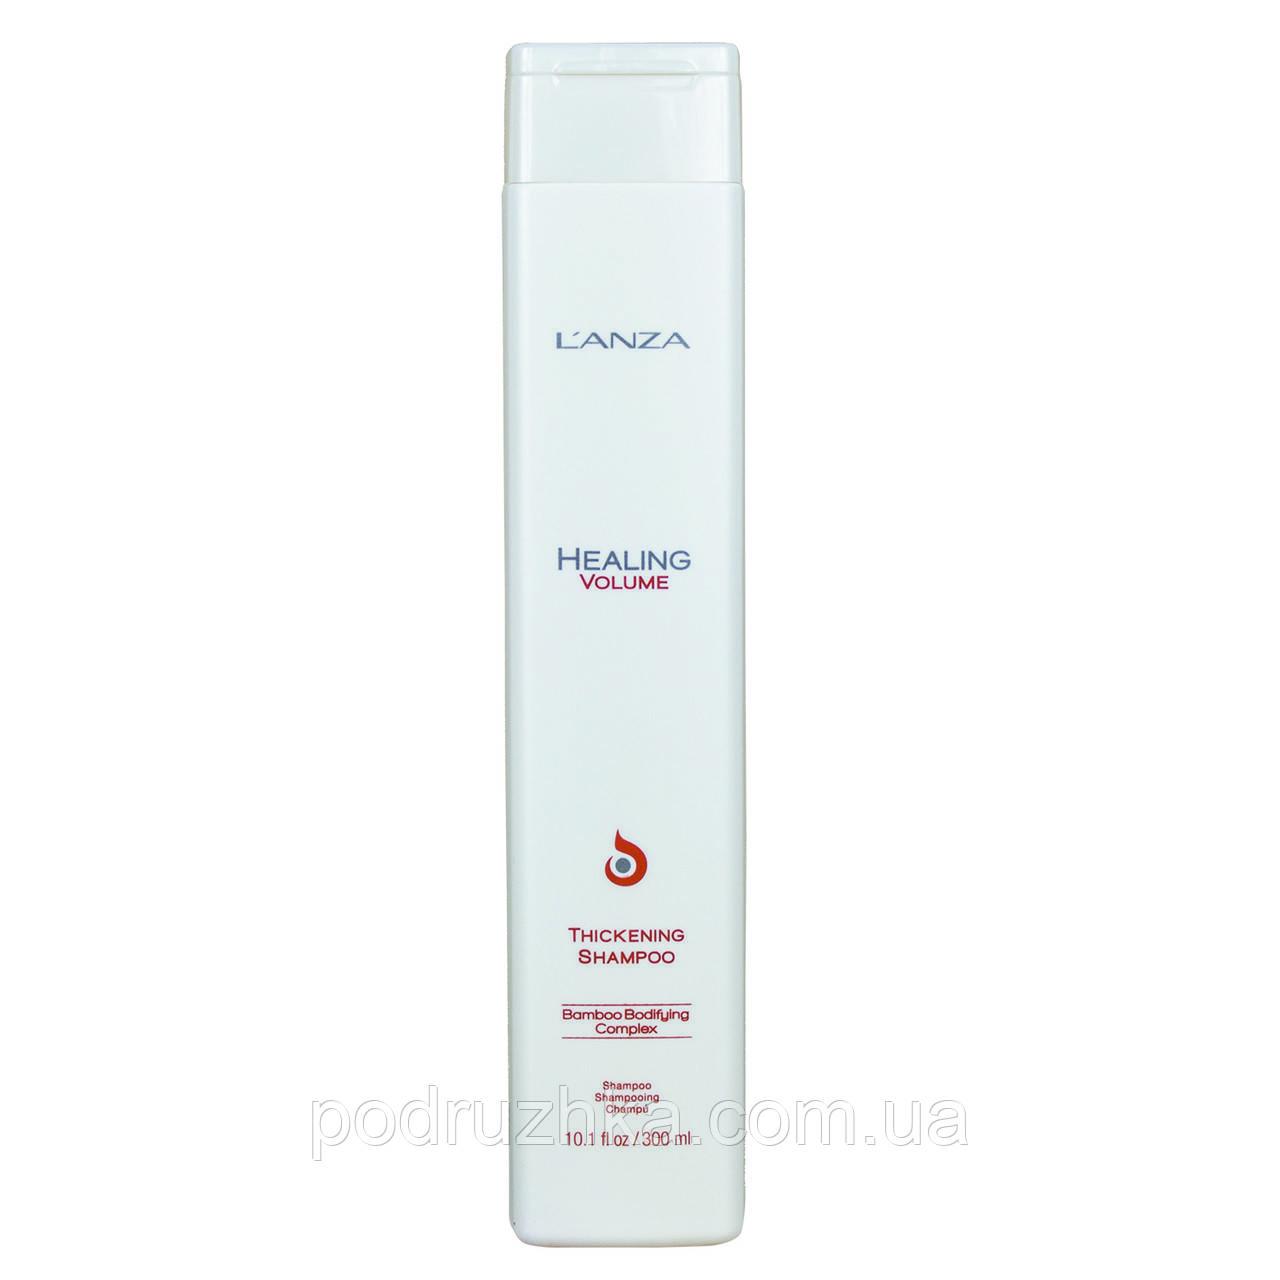 Lanza healing volume thickening shampoo Шампунь для наполнения и объема волос ph: 5.6, 300 мл